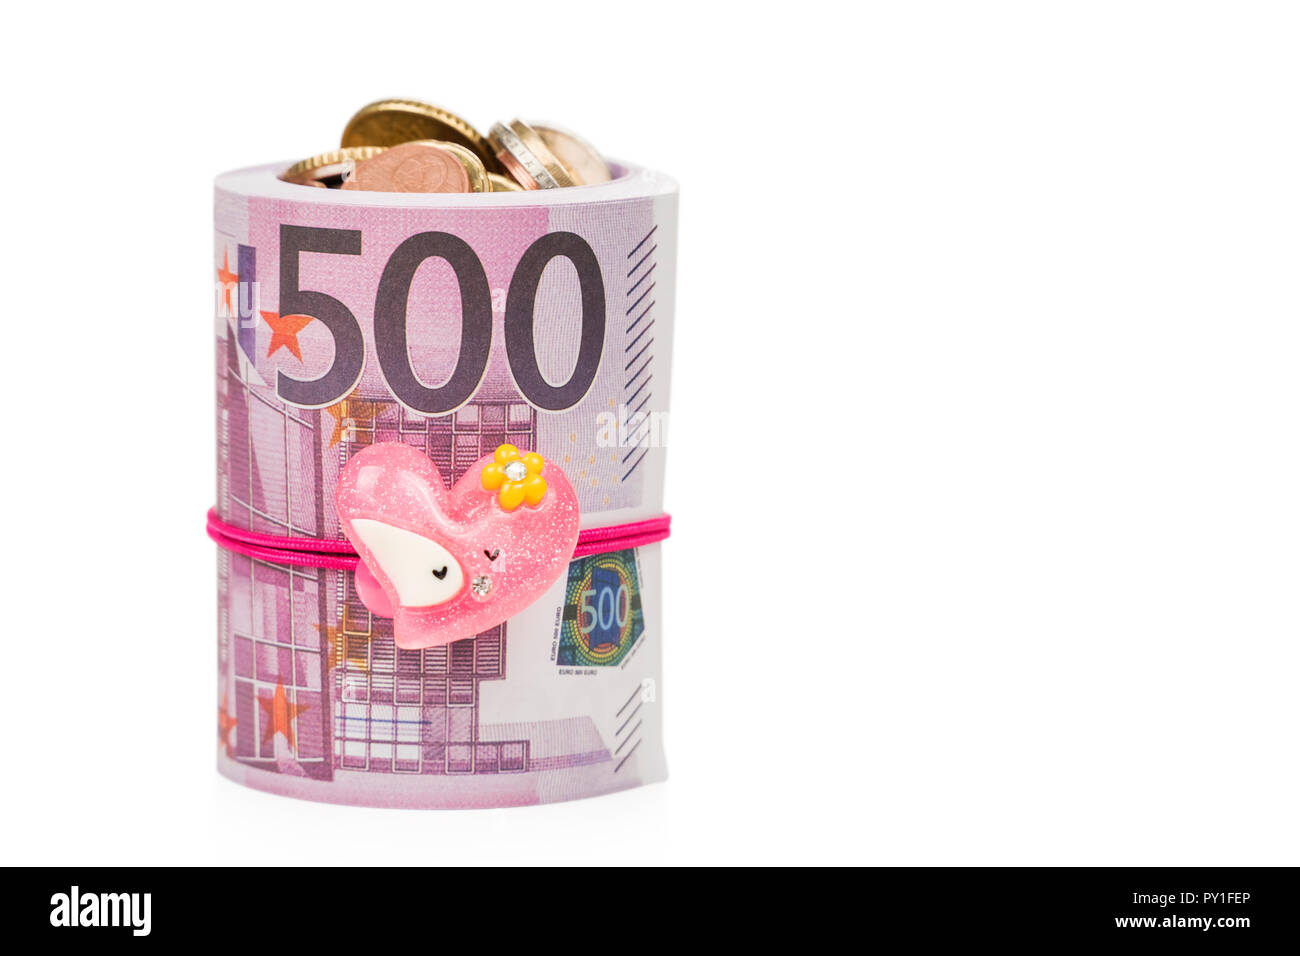 Münzen Papiergeld Als Geschenk Stockfoto Bild 223154254 Alamy